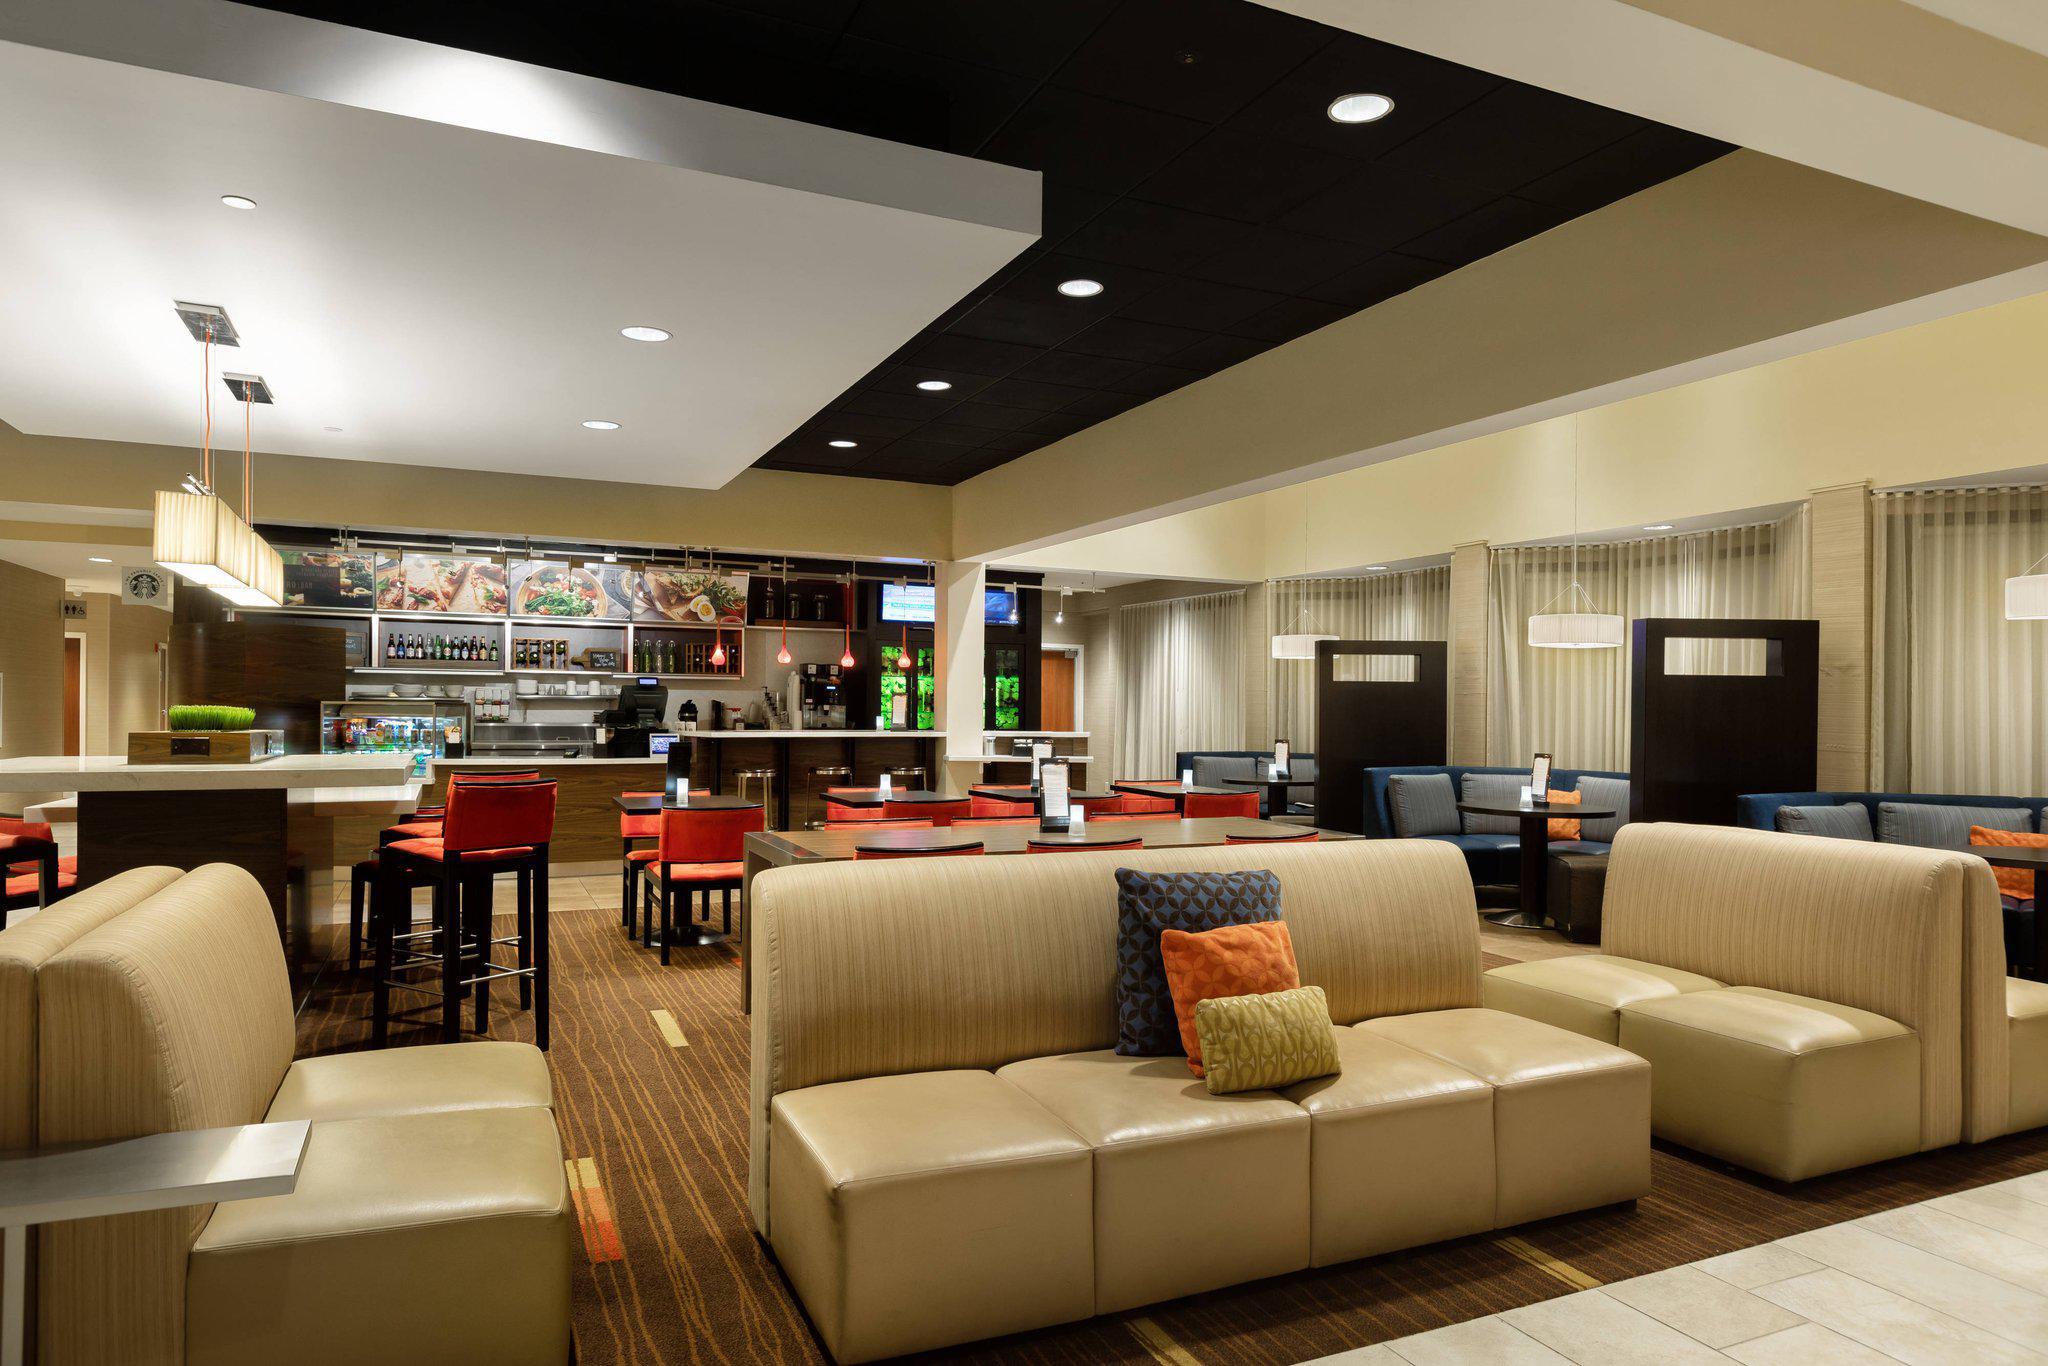 Courtyard by Marriott Dallas-Fort Worth/Bedford